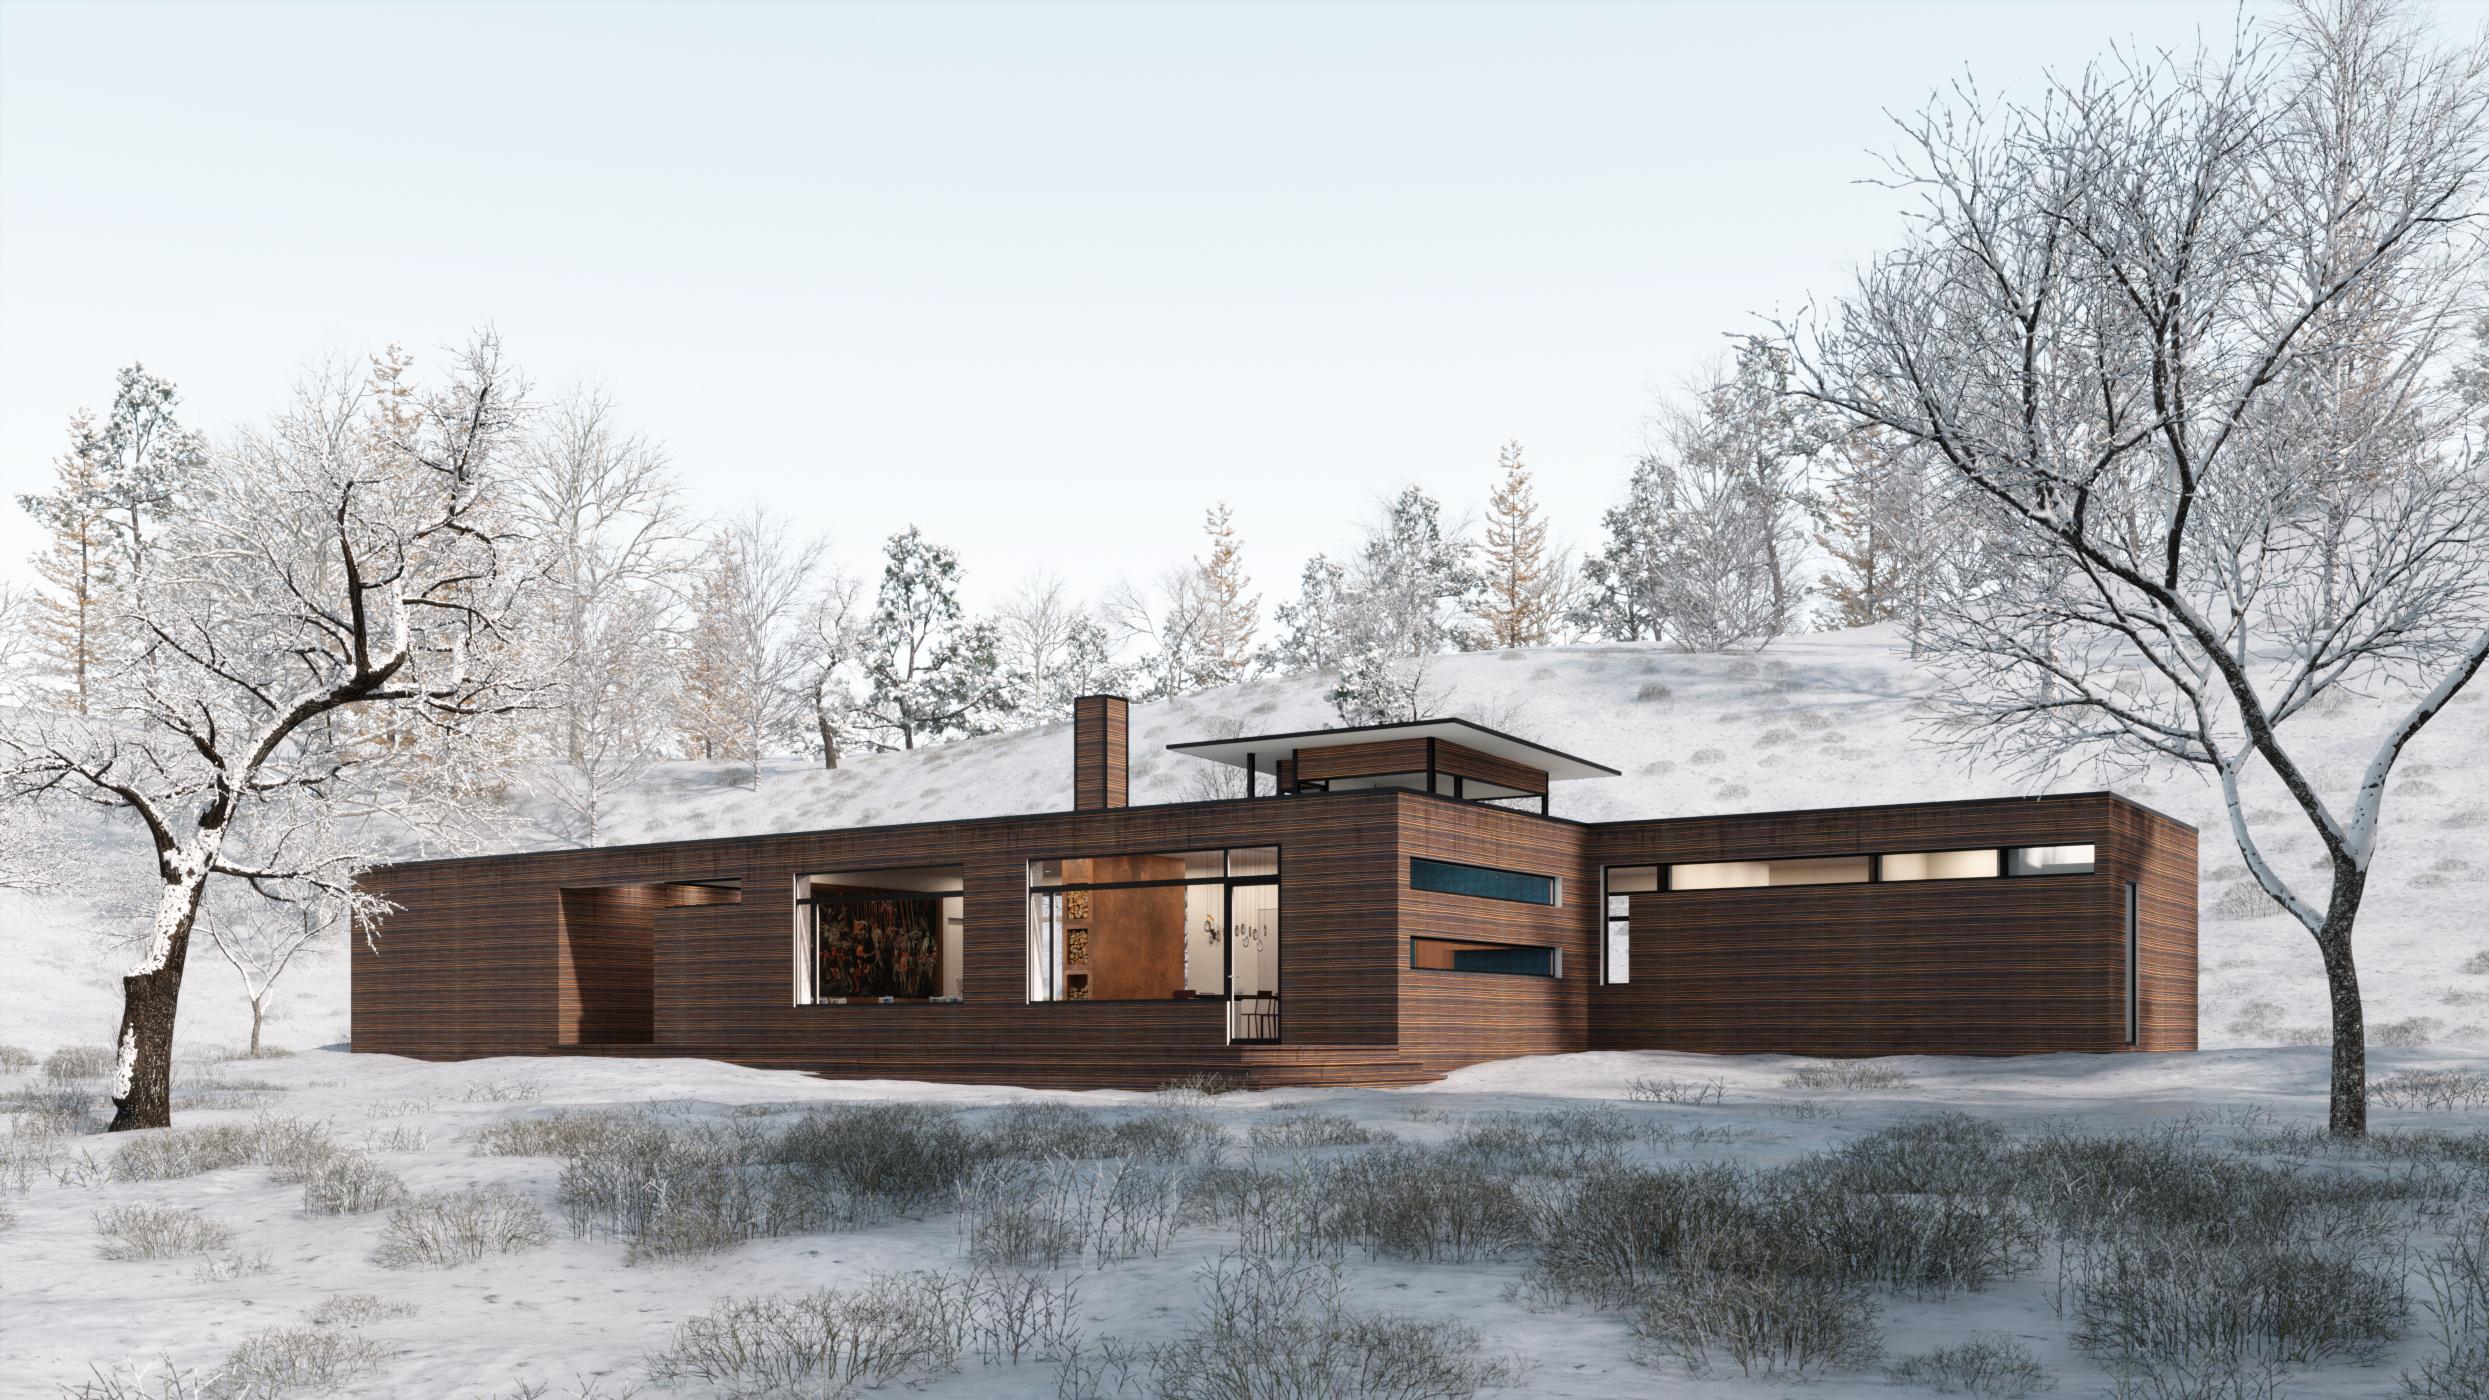 RDD HOUSE: HOME DESIGN